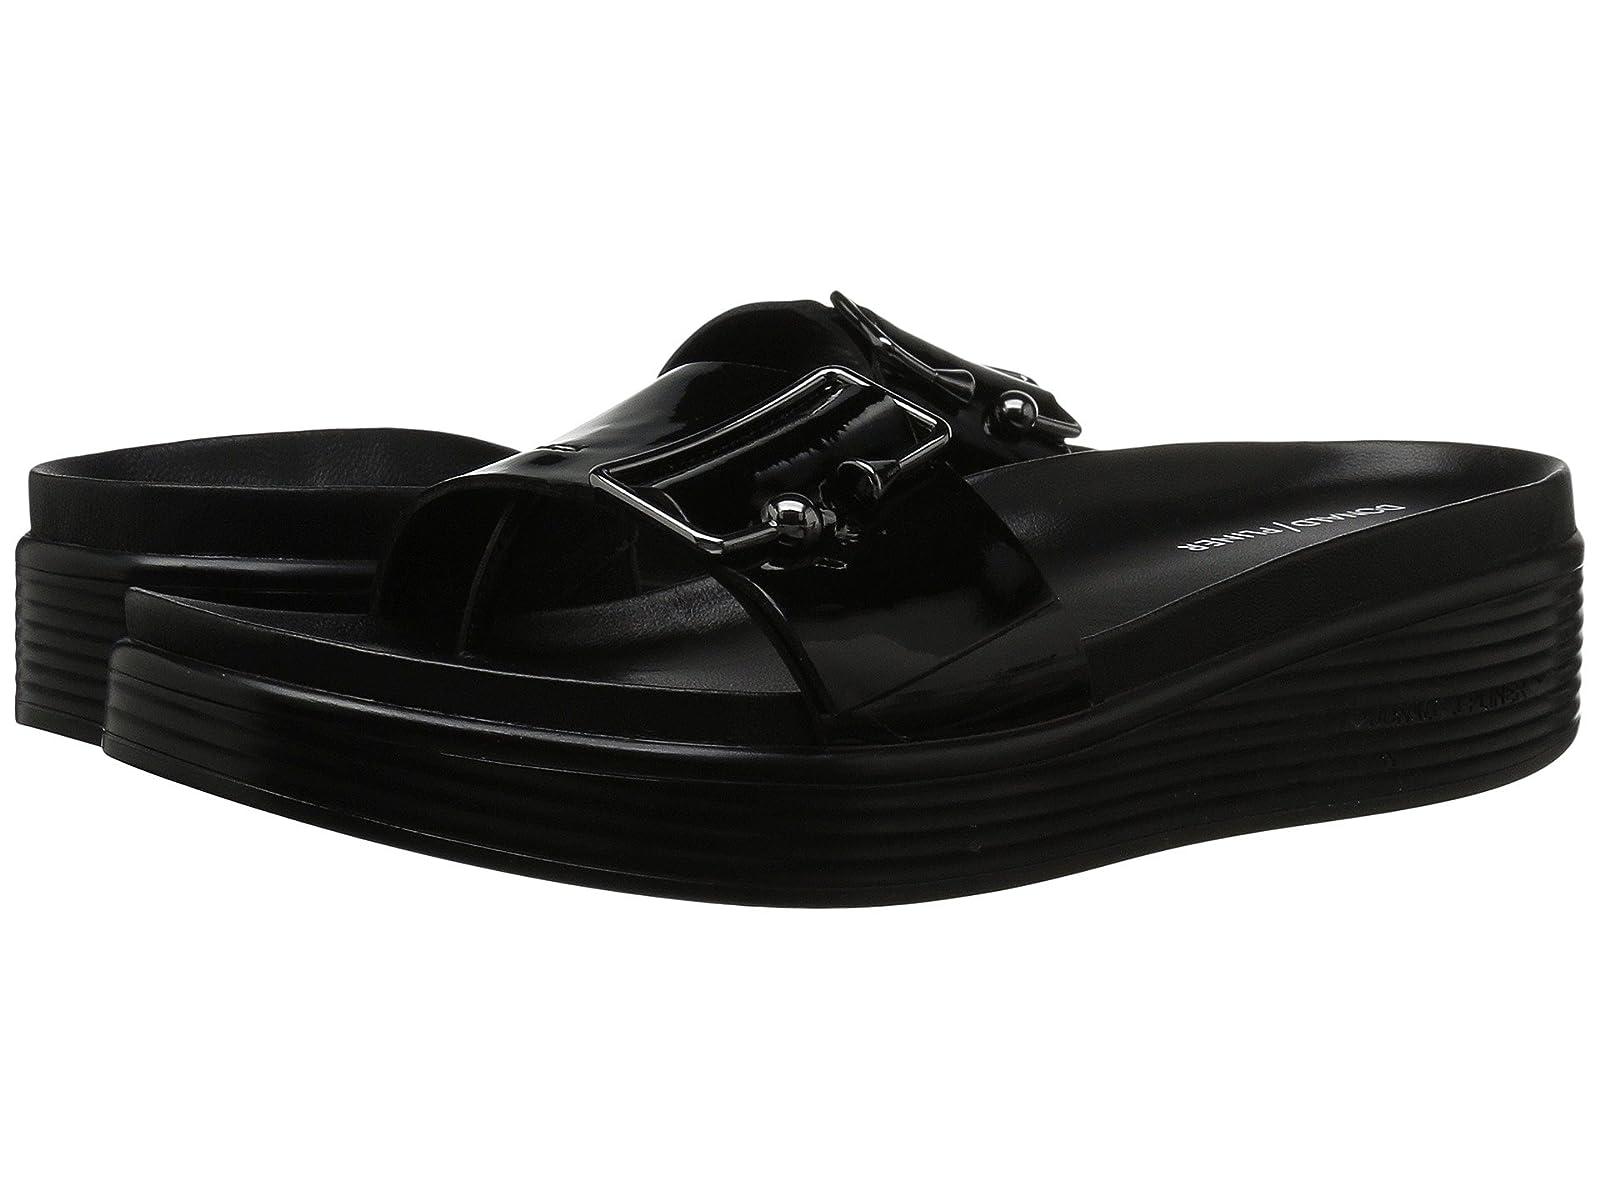 Donald J Pliner FaraCheap and distinctive eye-catching shoes